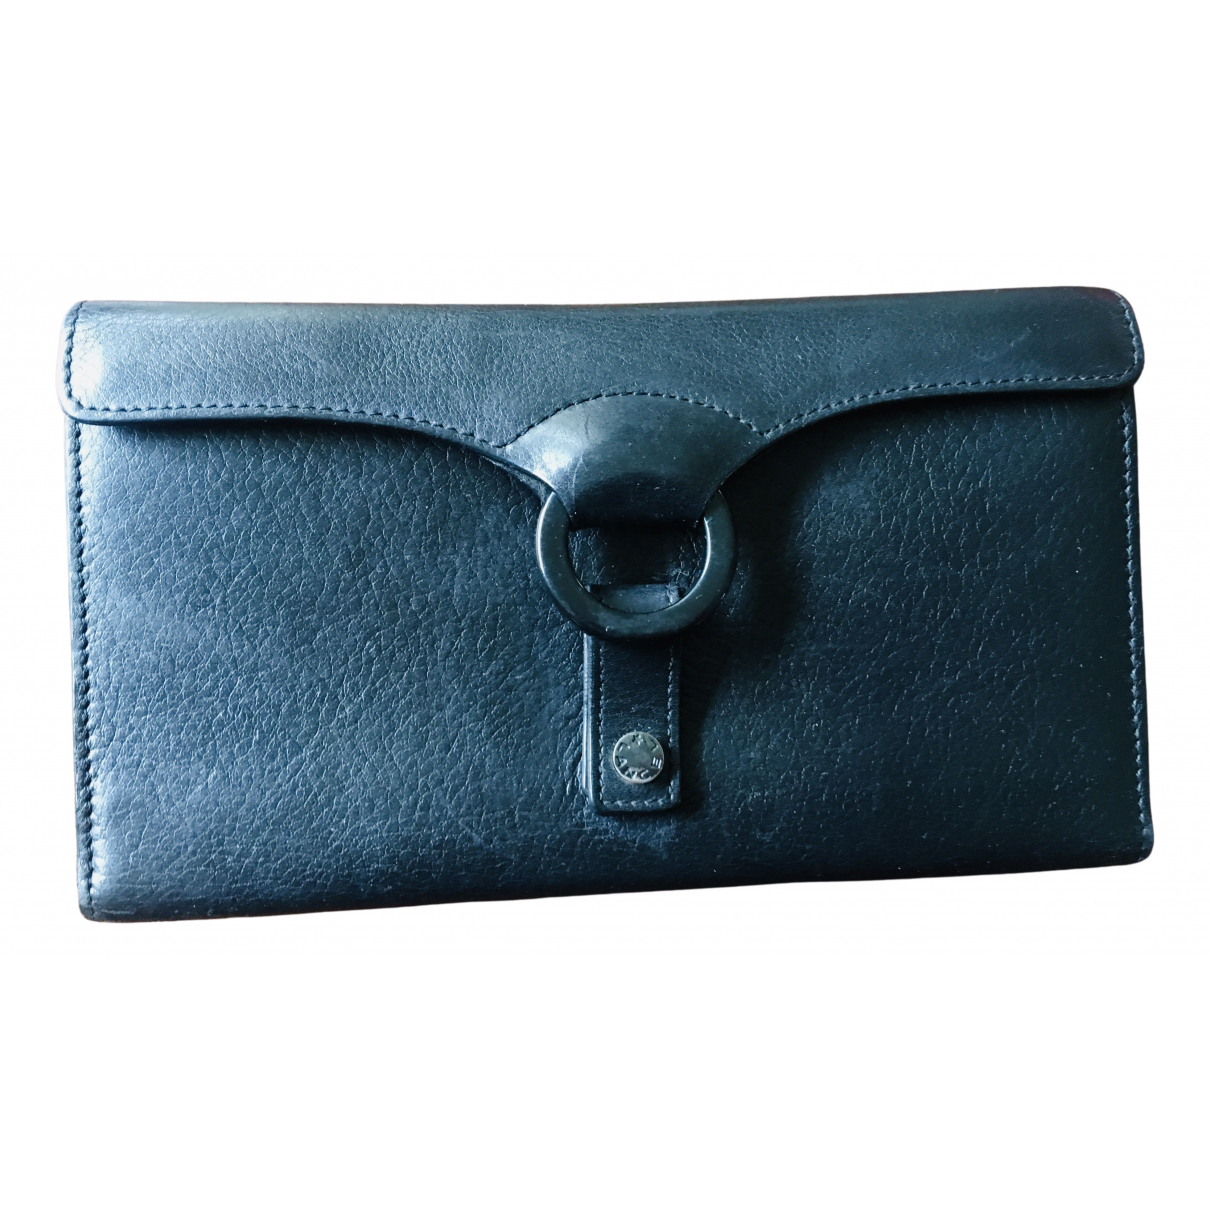 Lancel \N Portemonnaie in  Schwarz Leder